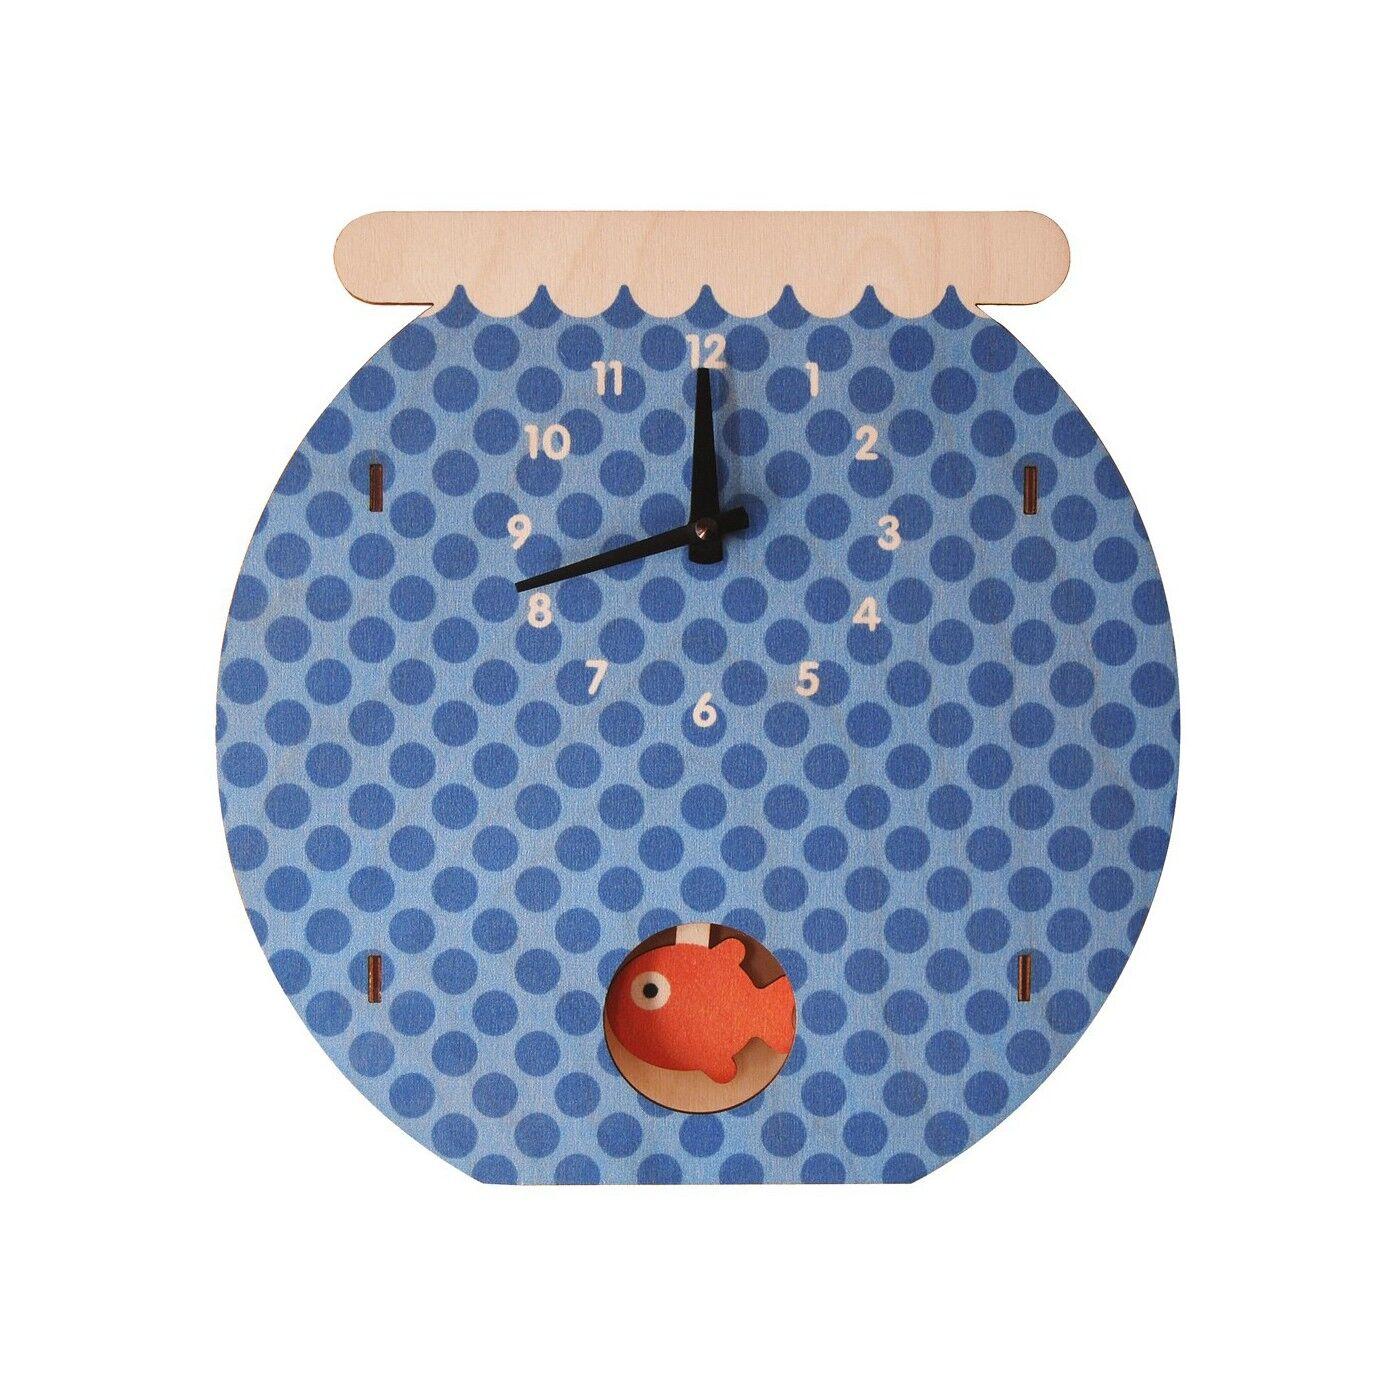 Modern Moose Horloge Murale à Balancier Fishbowl pour Enfants Modern Moose